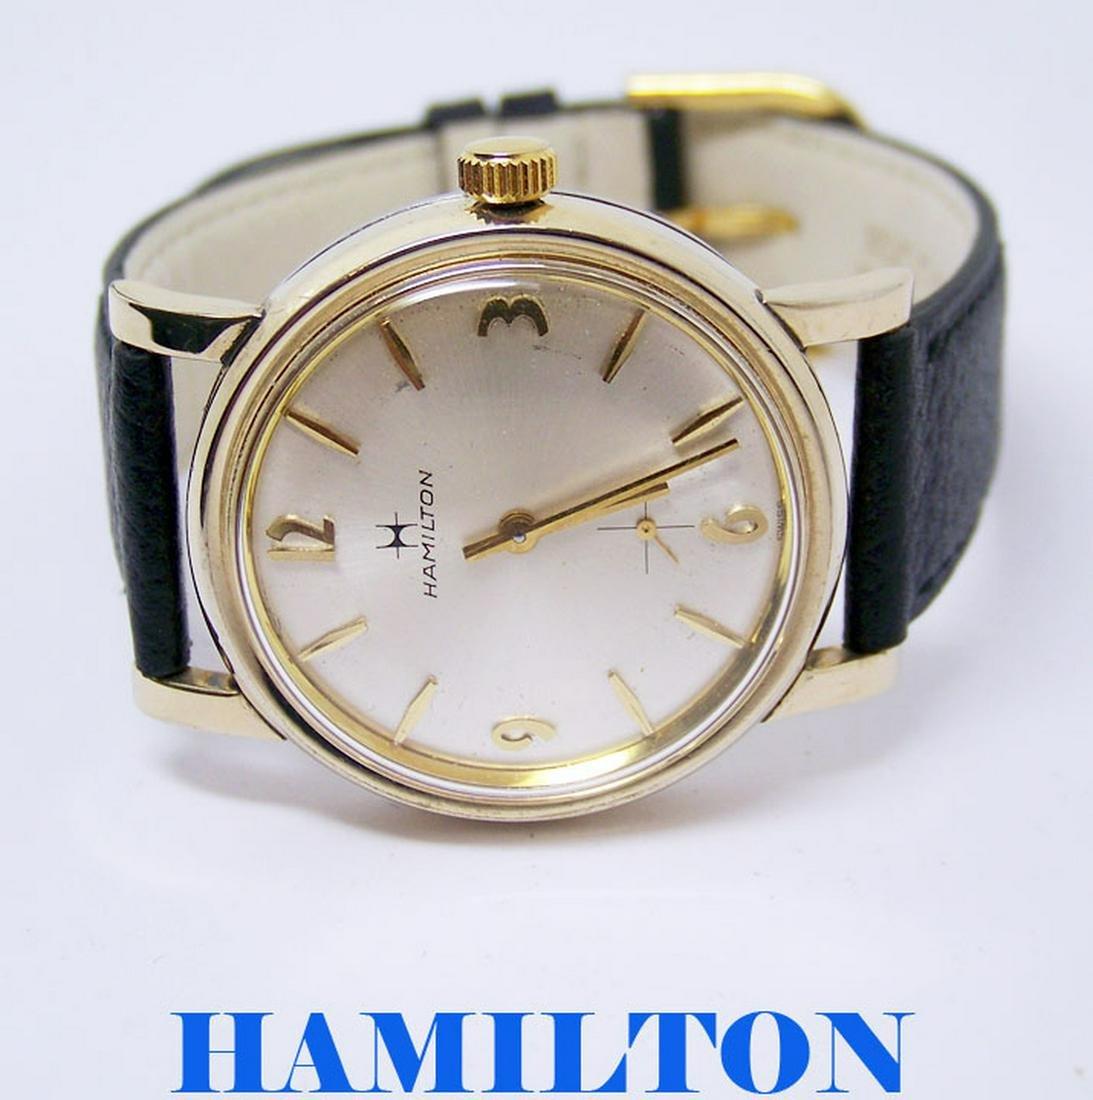 Vintage 10k GF HAMILTON Winding Watch c.1970s Cal.639